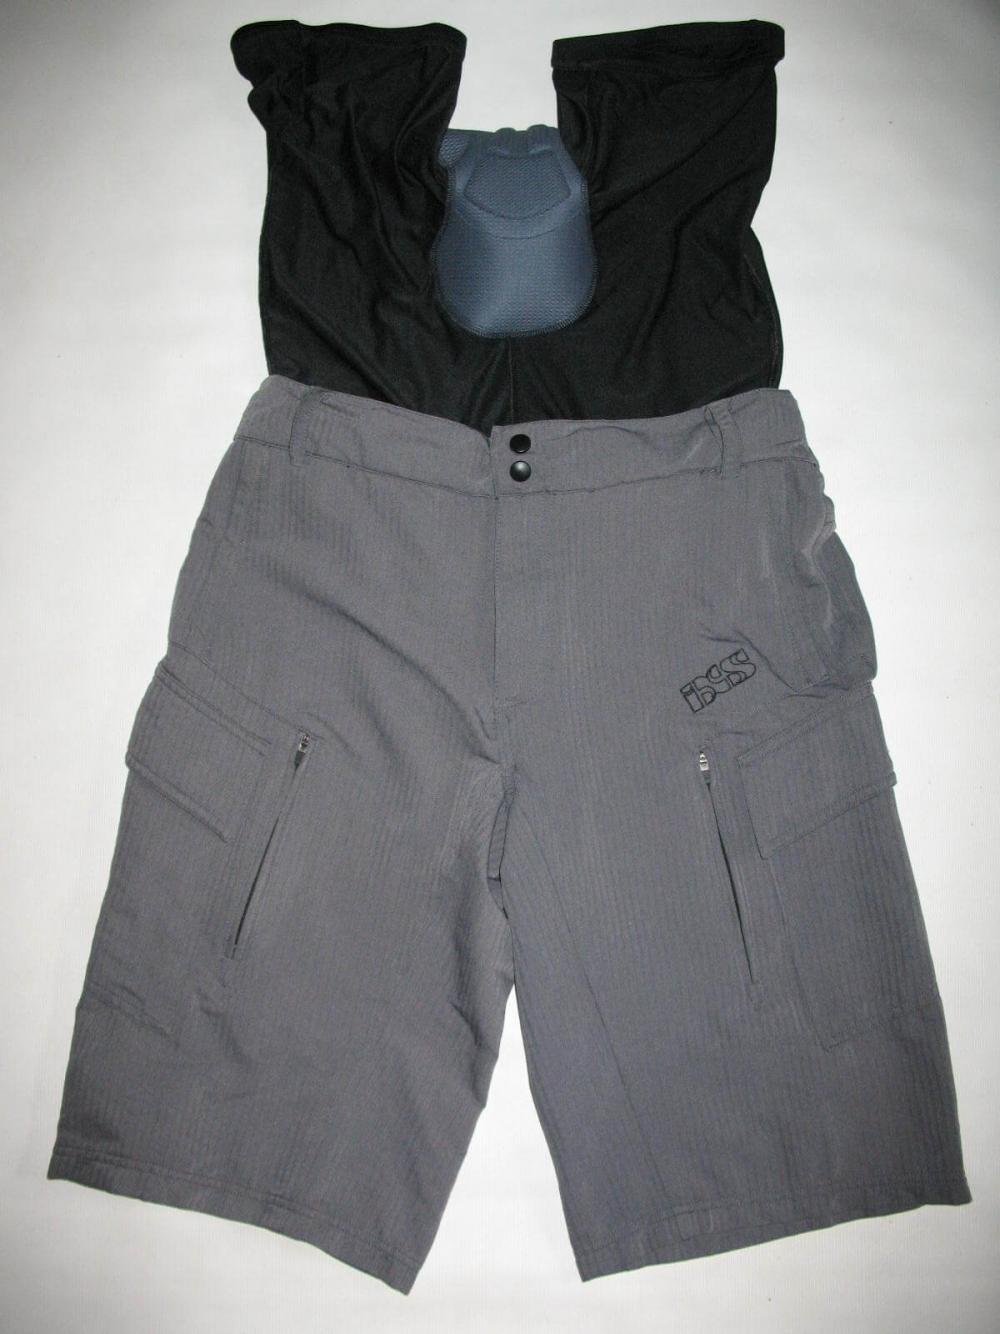 Велошорты IXS bike shorts (размер М) - 3